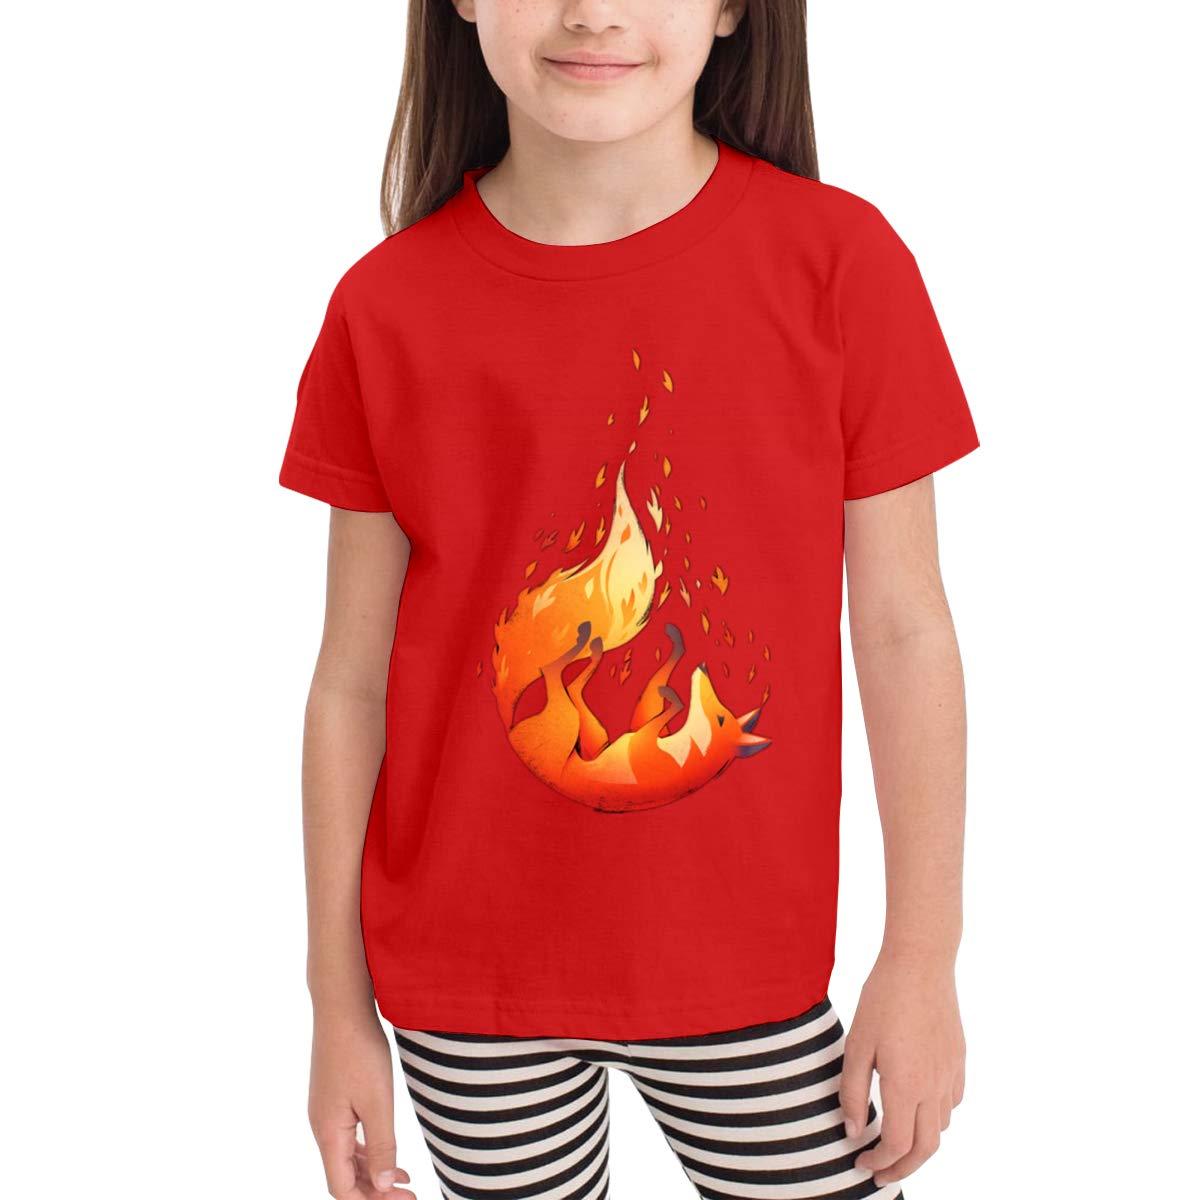 Failing Fox 100/% Cotton Toddler Baby Boys Girls Kids Short Sleeve T Shirt Top Tee Clothes 2-6 T